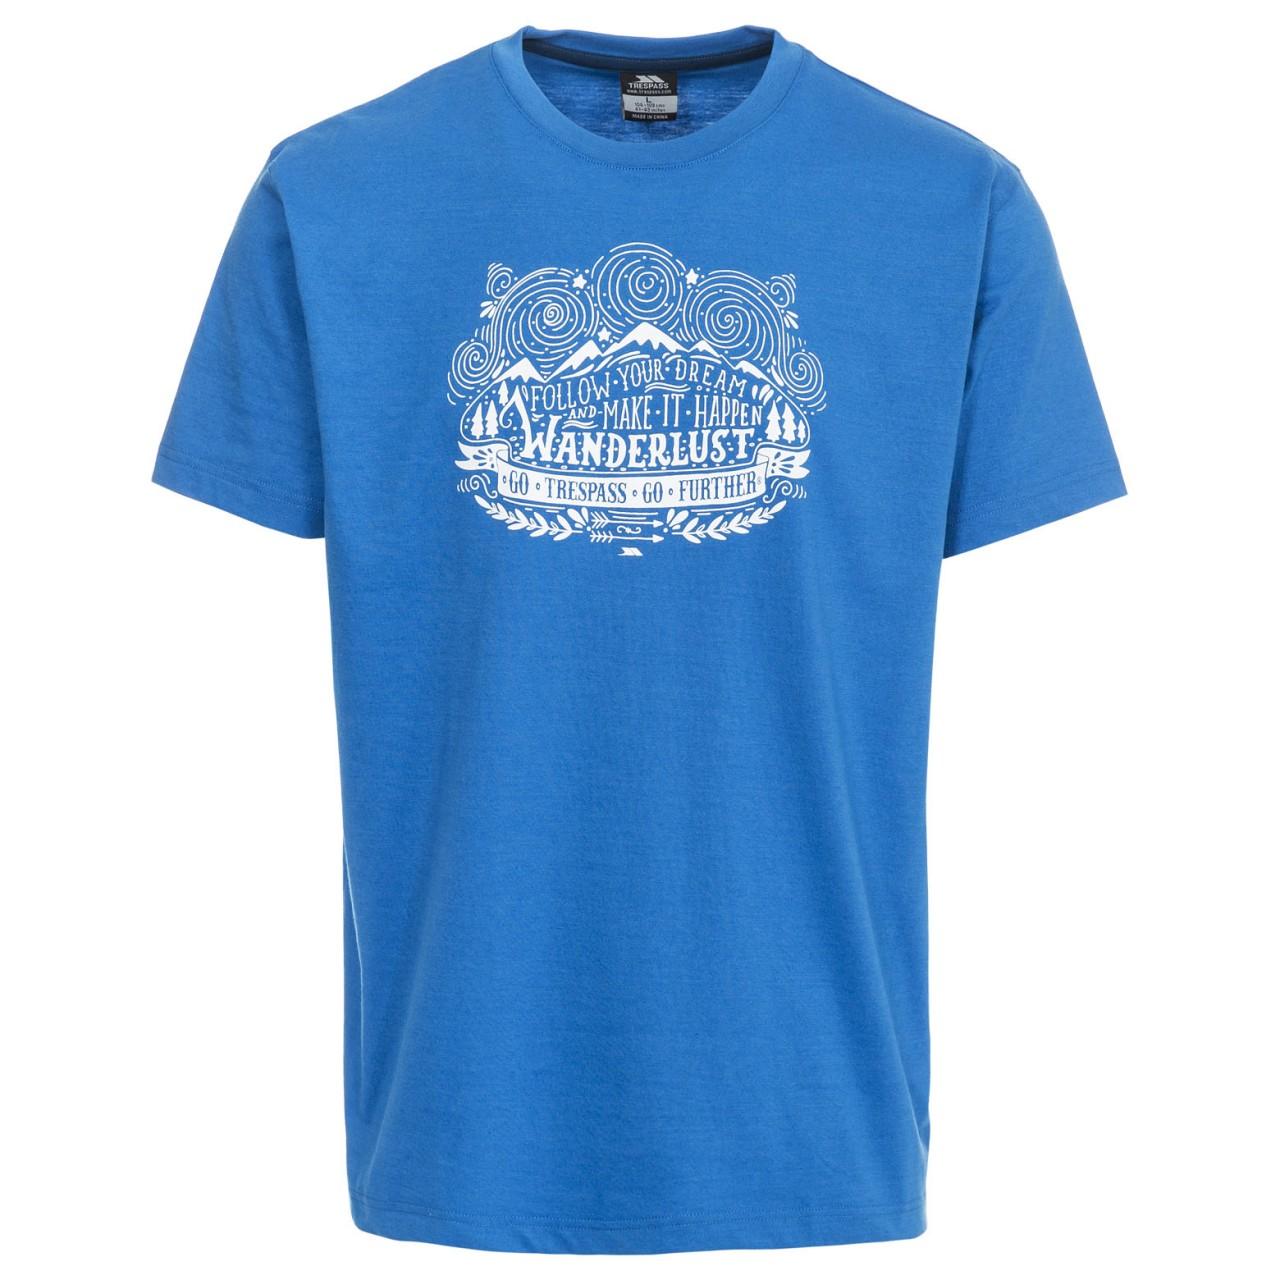 Trespass Mens Hainey Short Sleeve T-Shirt (S) (Bright Blue)